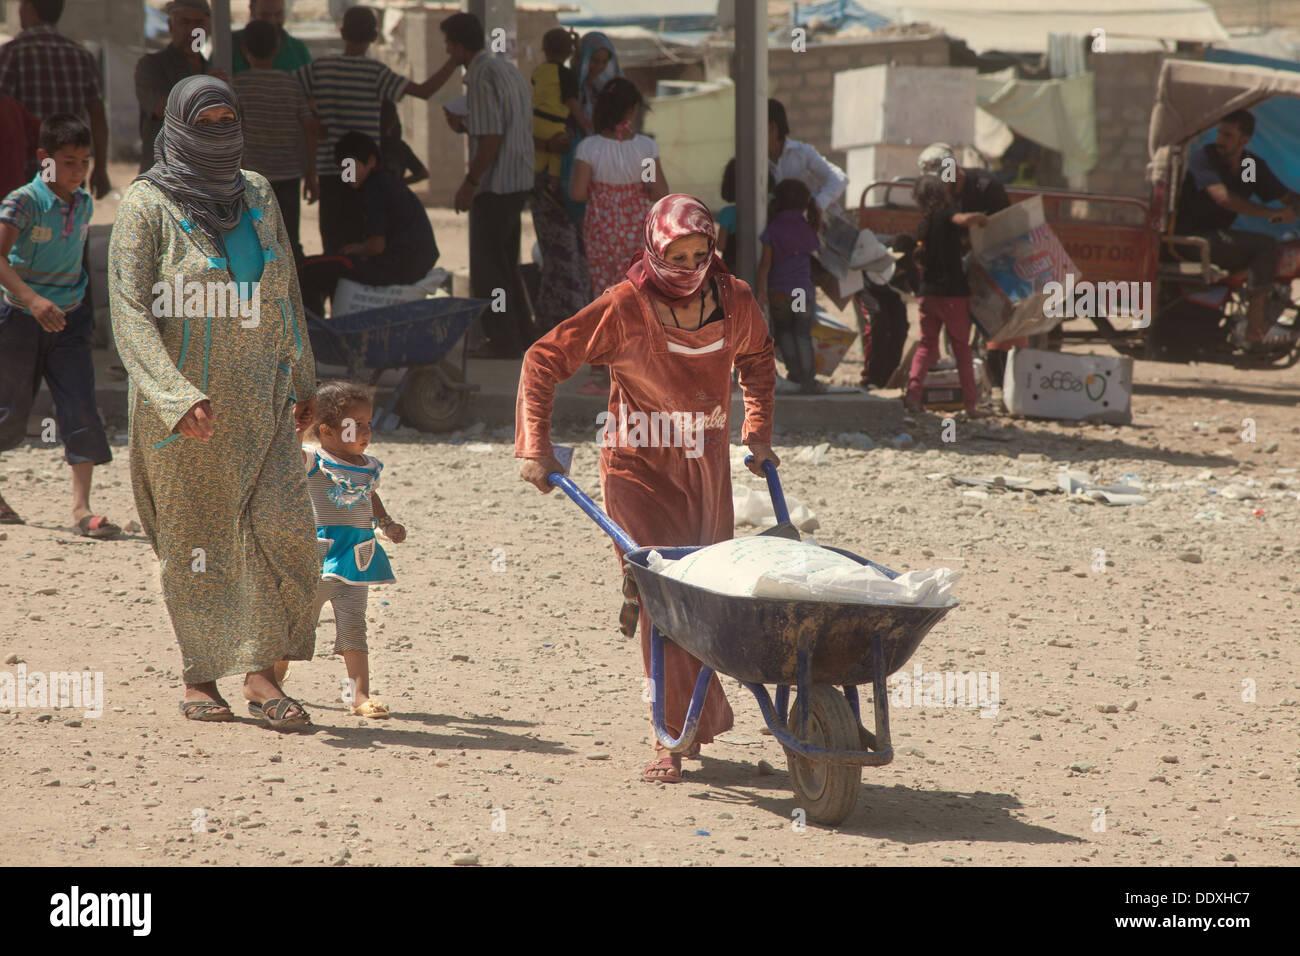 Domiz, Duhok province - Northern Iraq (Iraqi Kurdistan) - Domiz Refugees Camp Life in the camp. Women provide for every needs - Stock Image